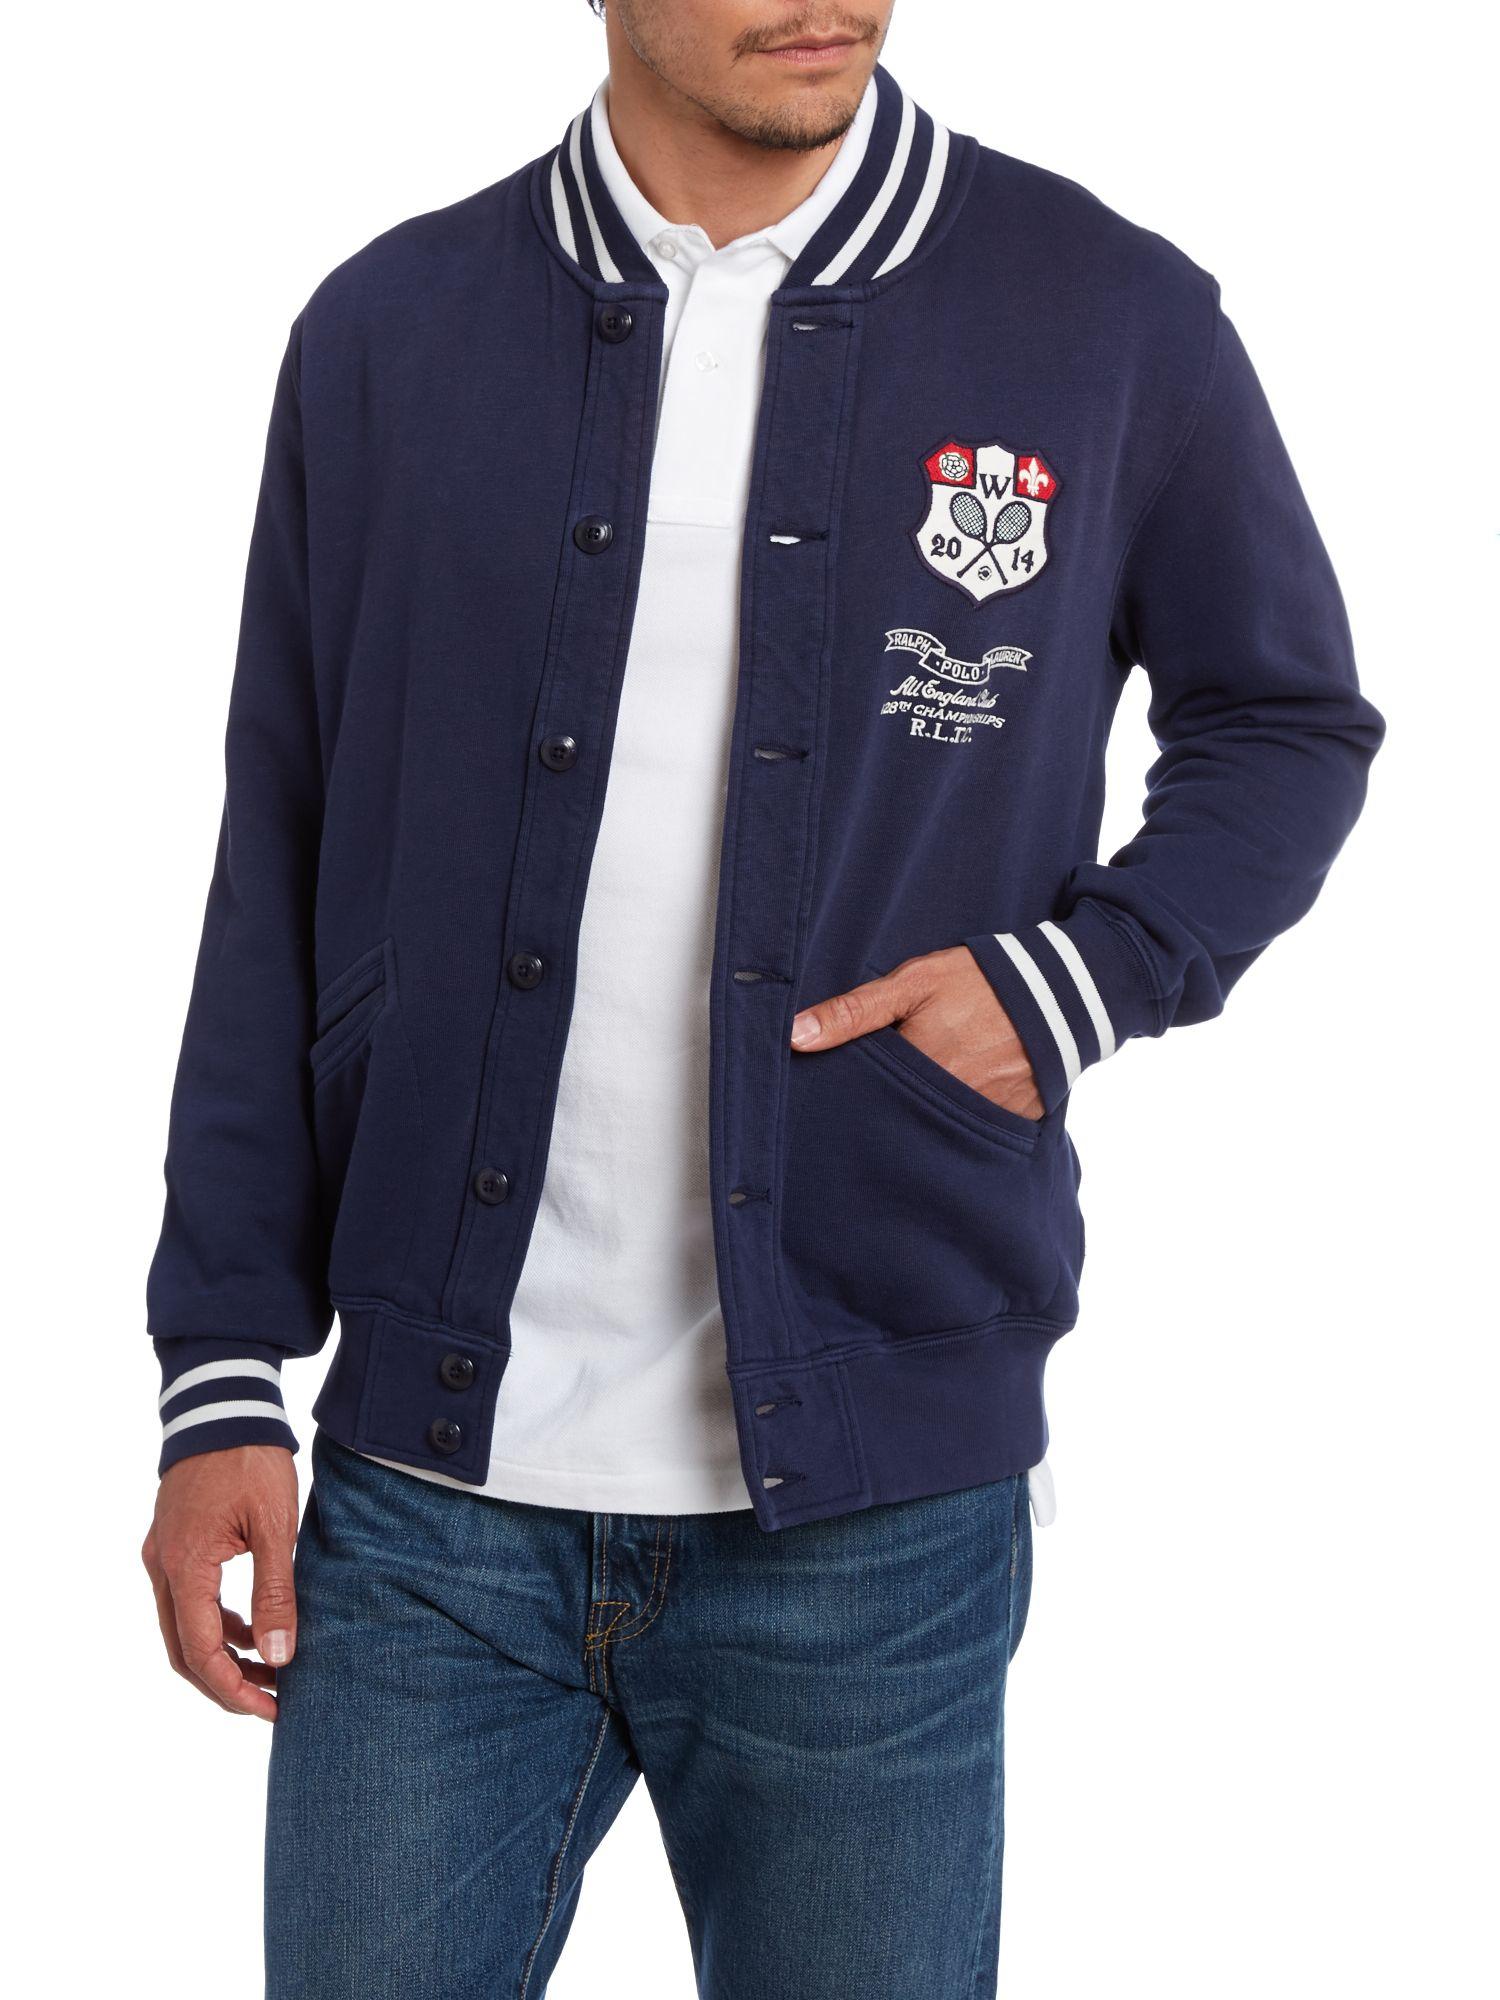 Ralph Ralph Wimbledon Polo Lauren Lauren Wimbledon Jacket Polo iOPkuXZ